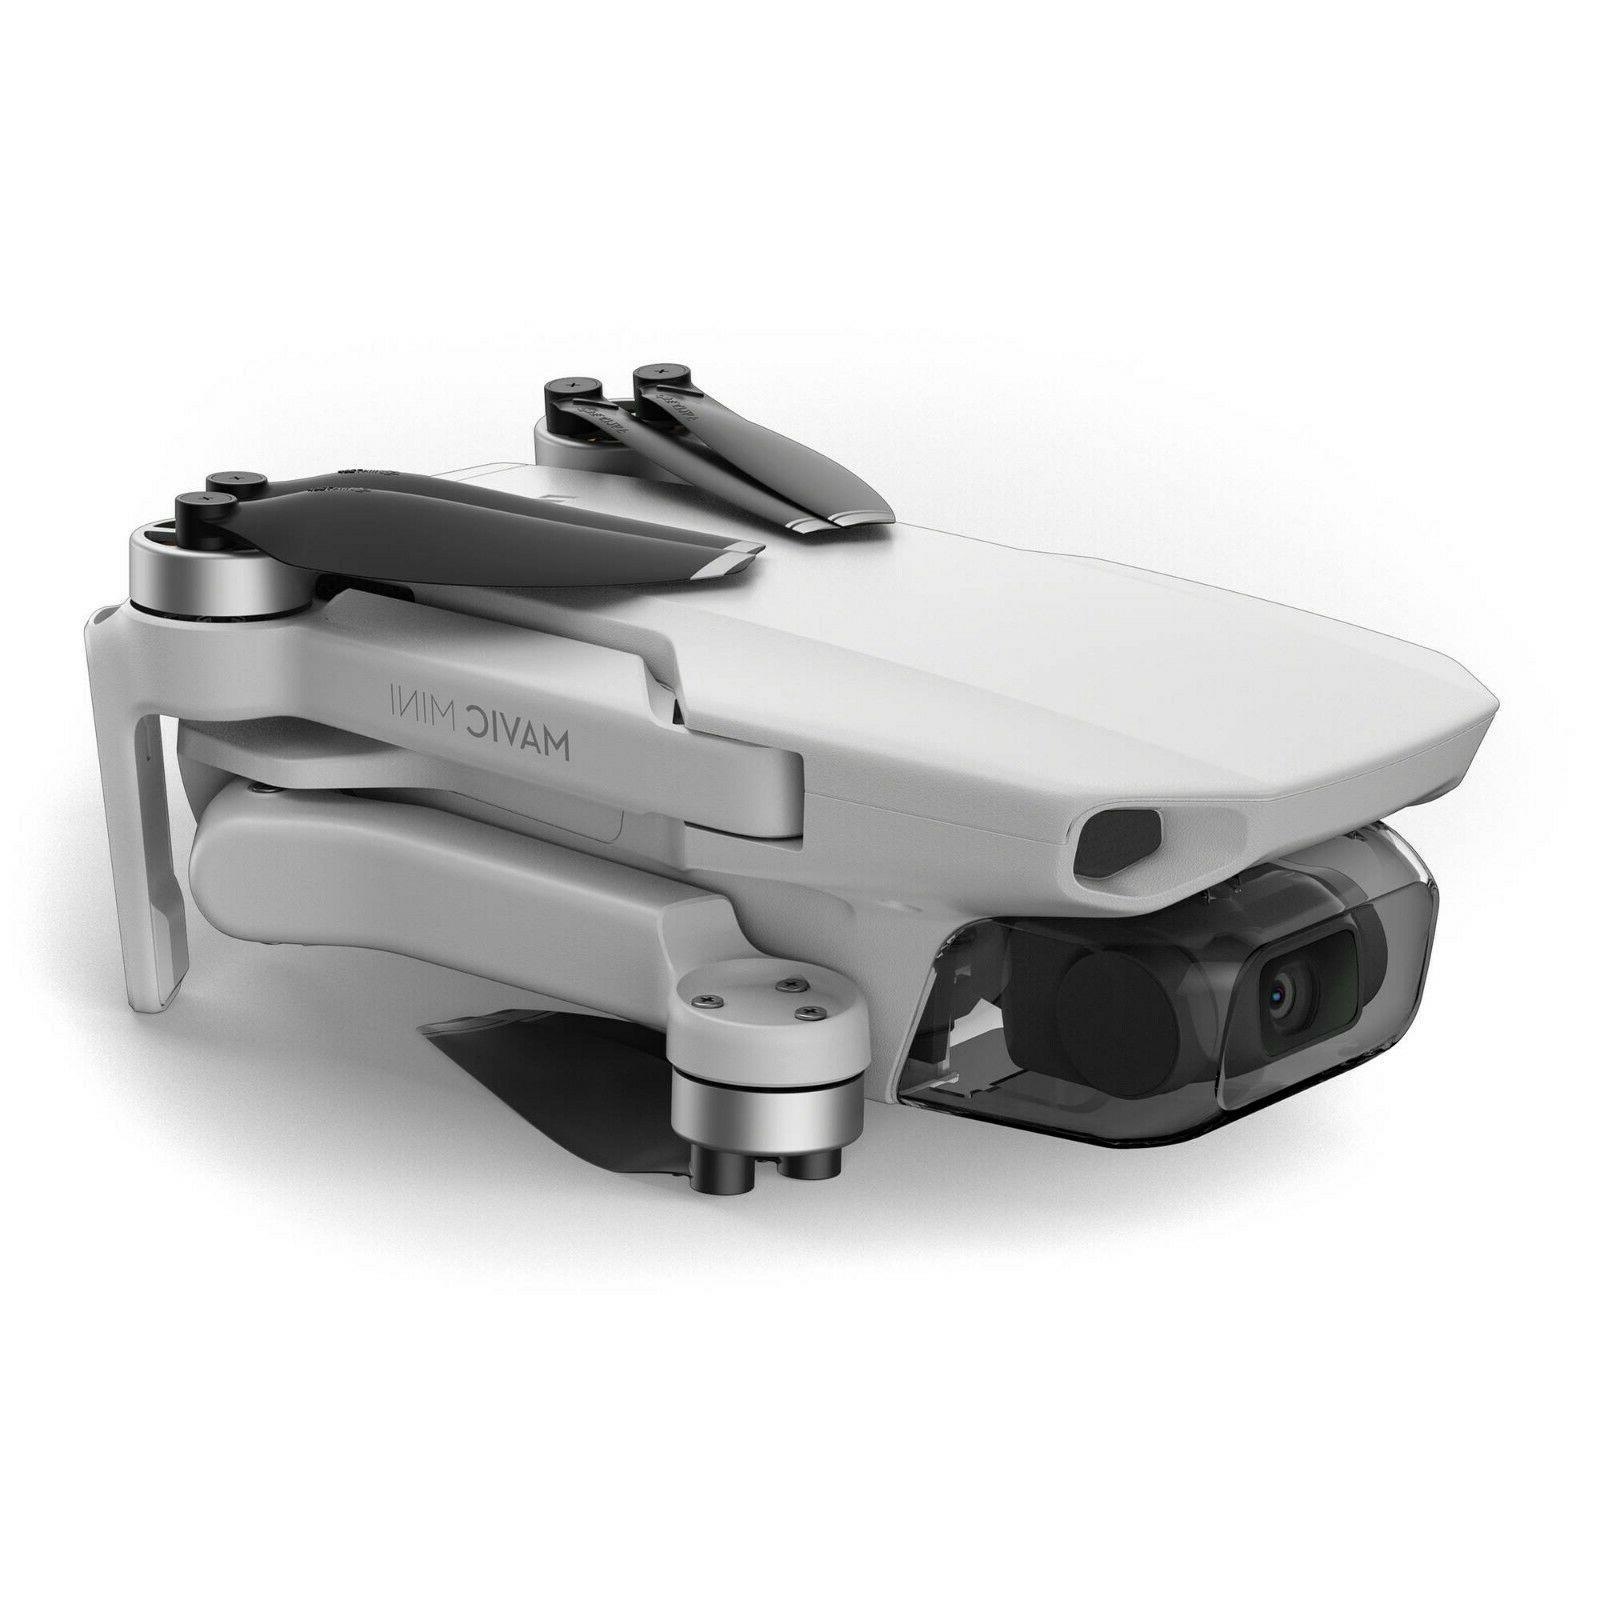 DJI Mini Drone Kit